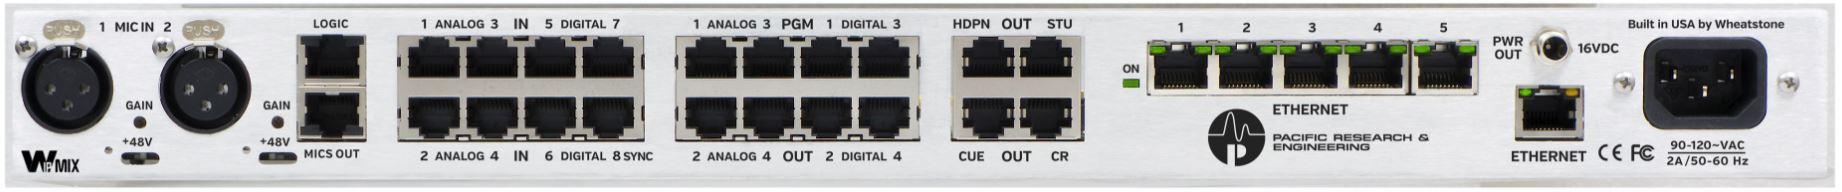 dmx ethernet wiring diagram [ 1100 x 800 Pixel ]